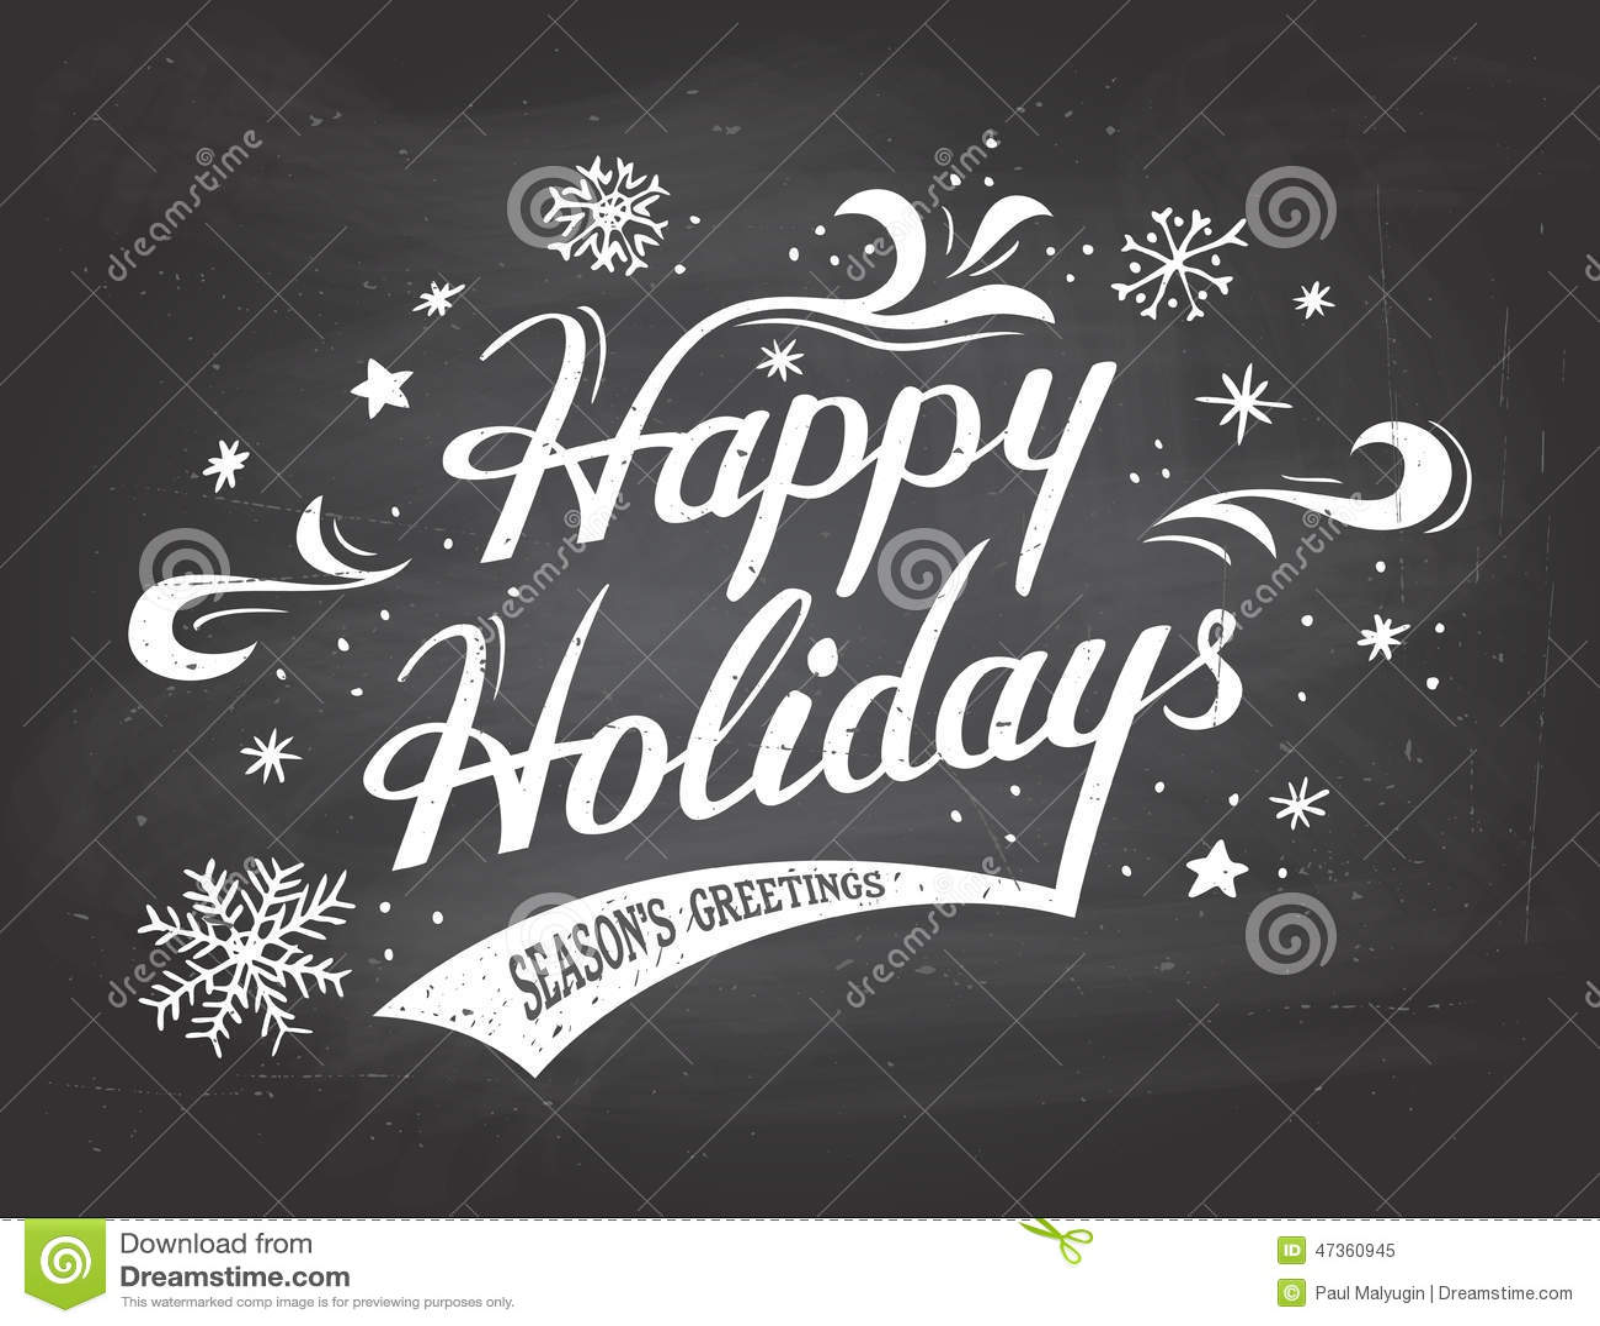 happy holidays on chalkboard background stock vector illustration